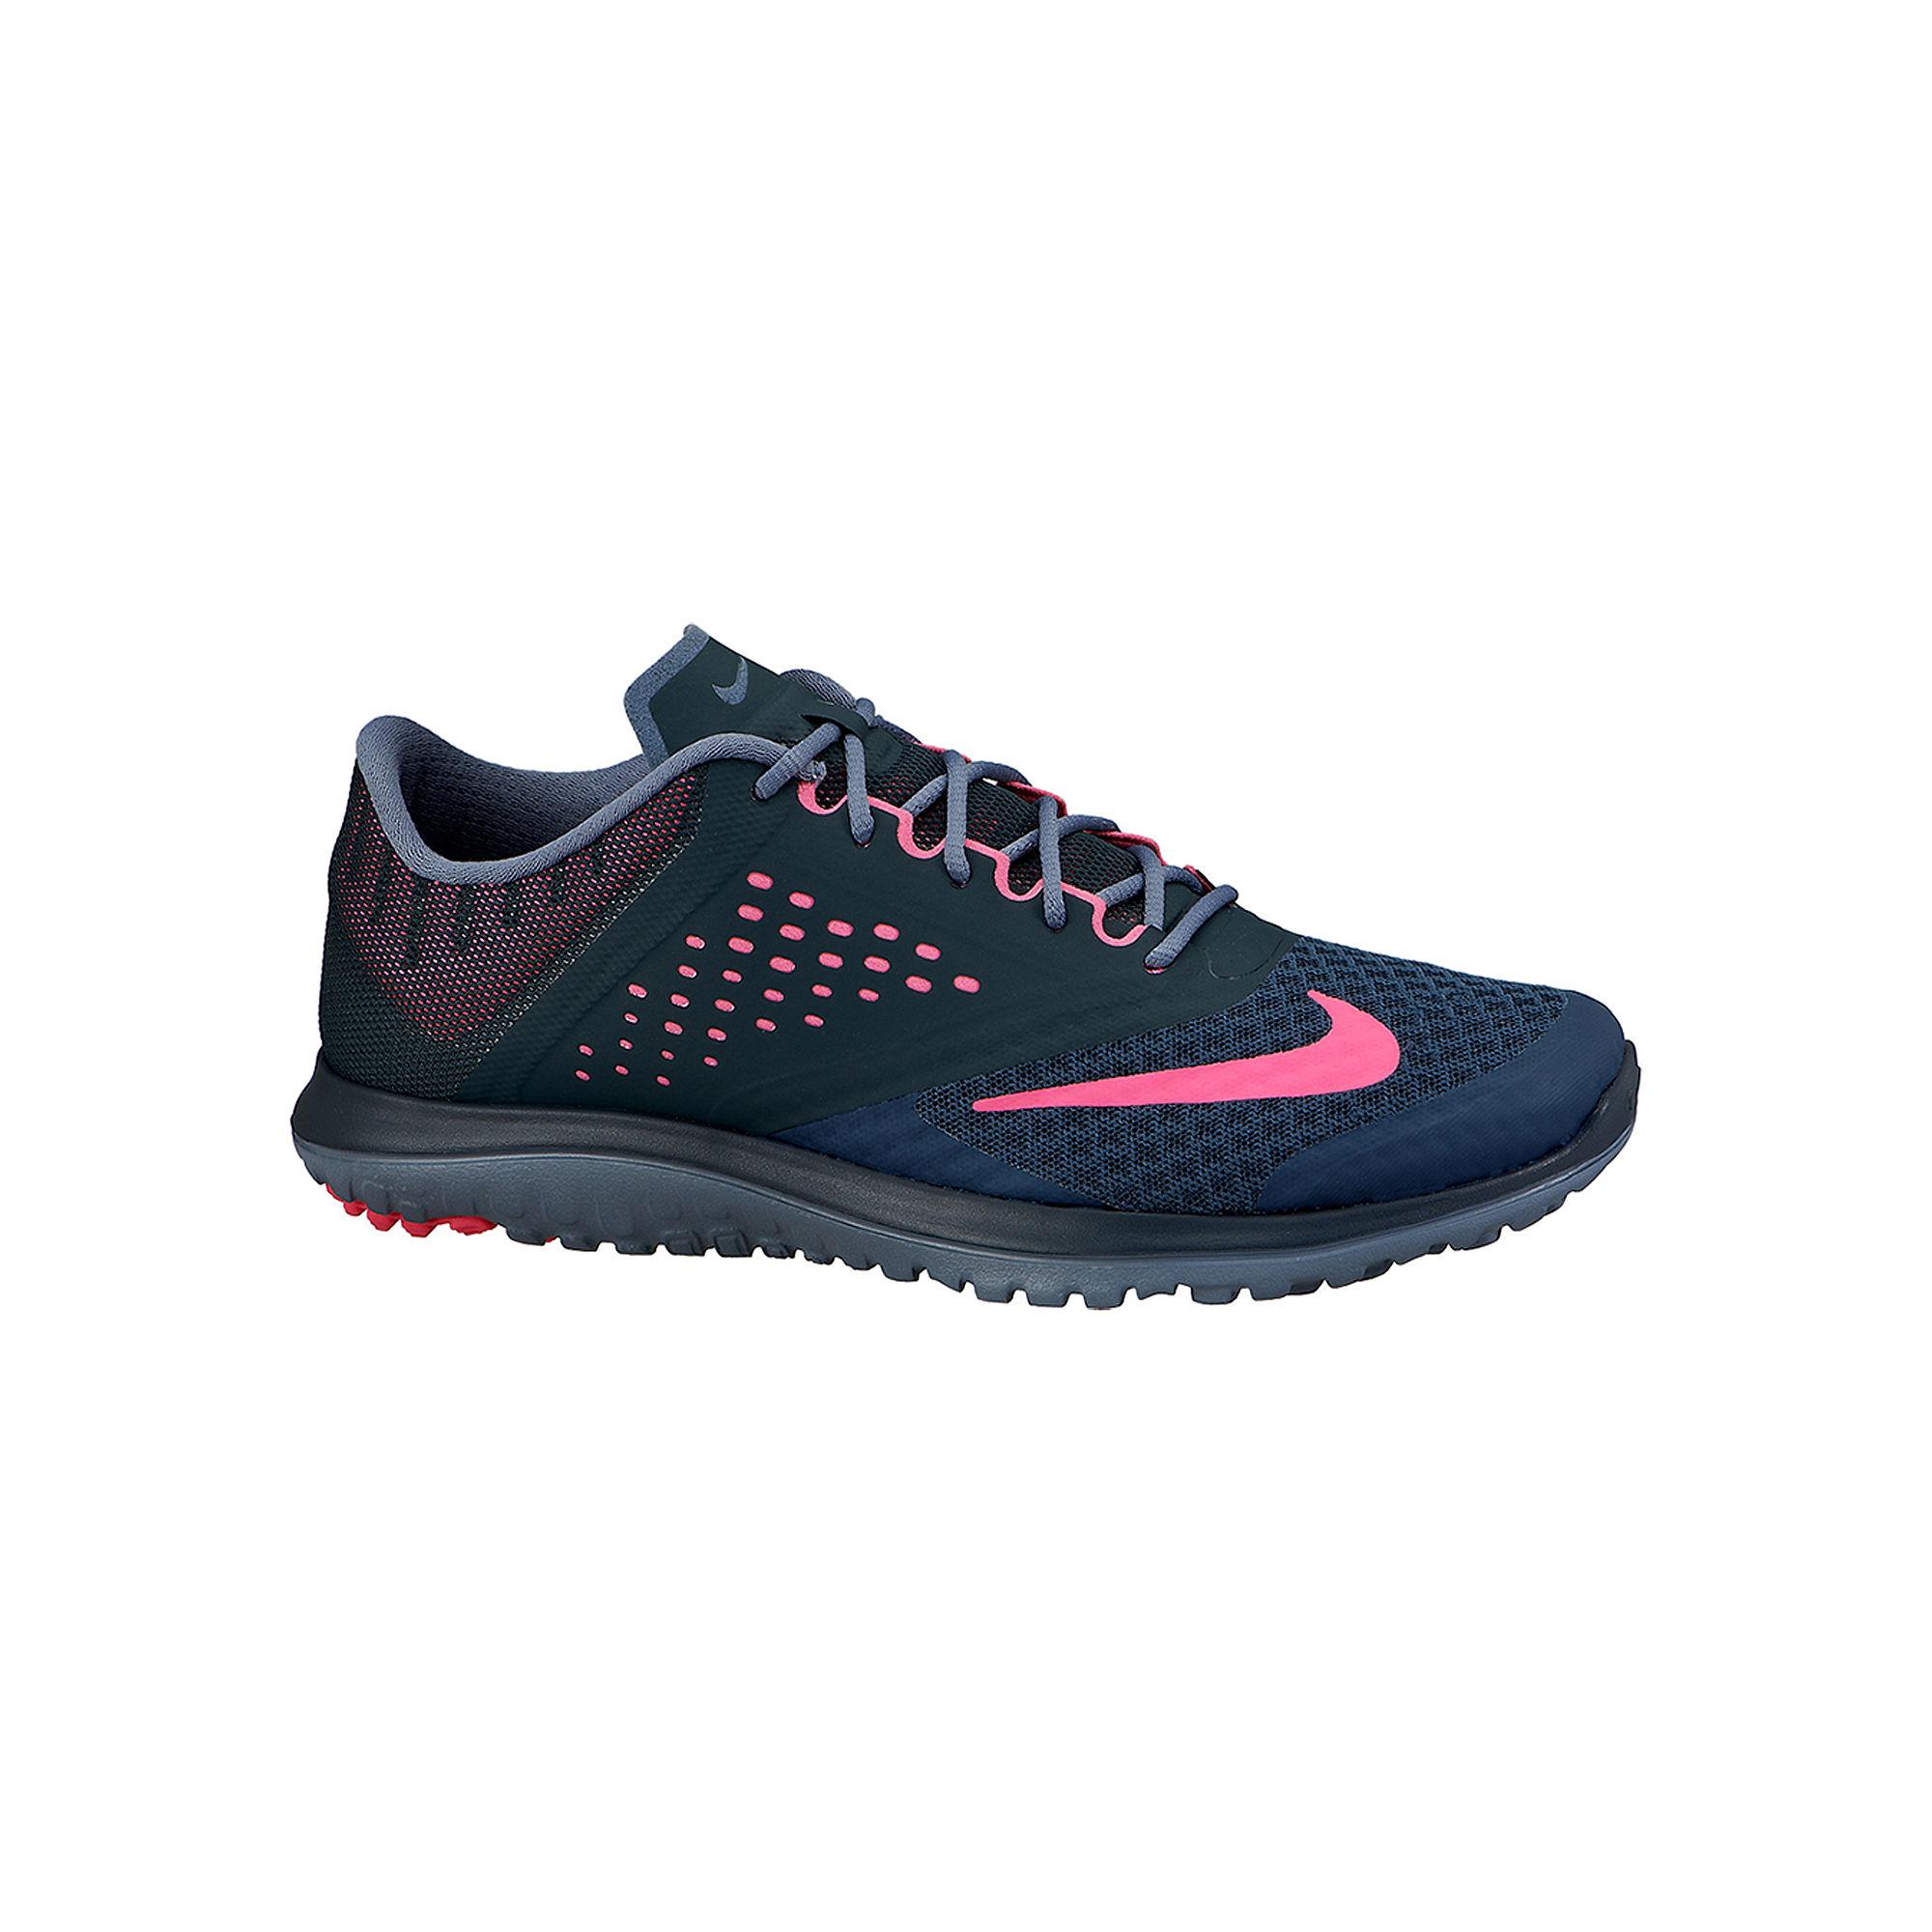 sports shoes 9d5c1 38527 ... Nike FS Lite 2 Womens Running Shoes. UPC 885259775035